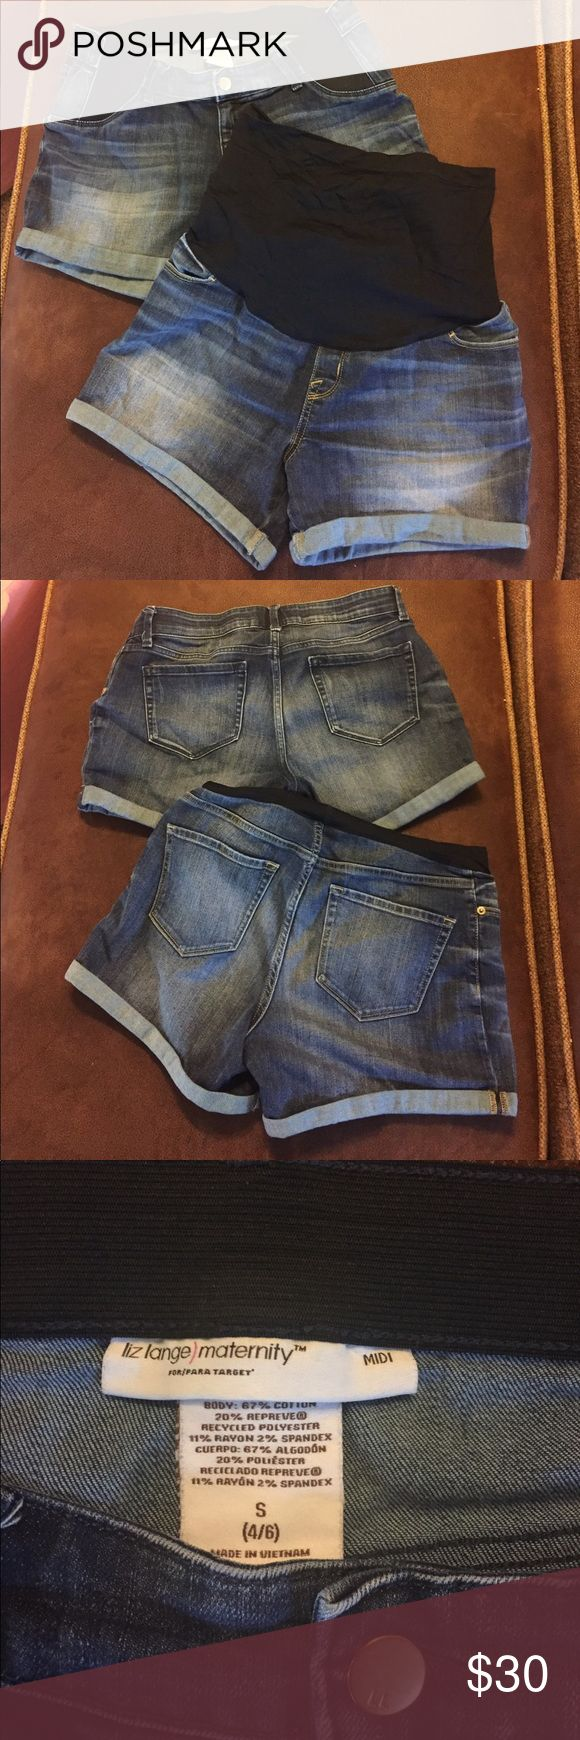 Maternity Shorts Bundle Liz Lange maternity shorts. Great condition. MIDI shorts. Both size small (4/6). Liz Lange Shorts Jean Shorts